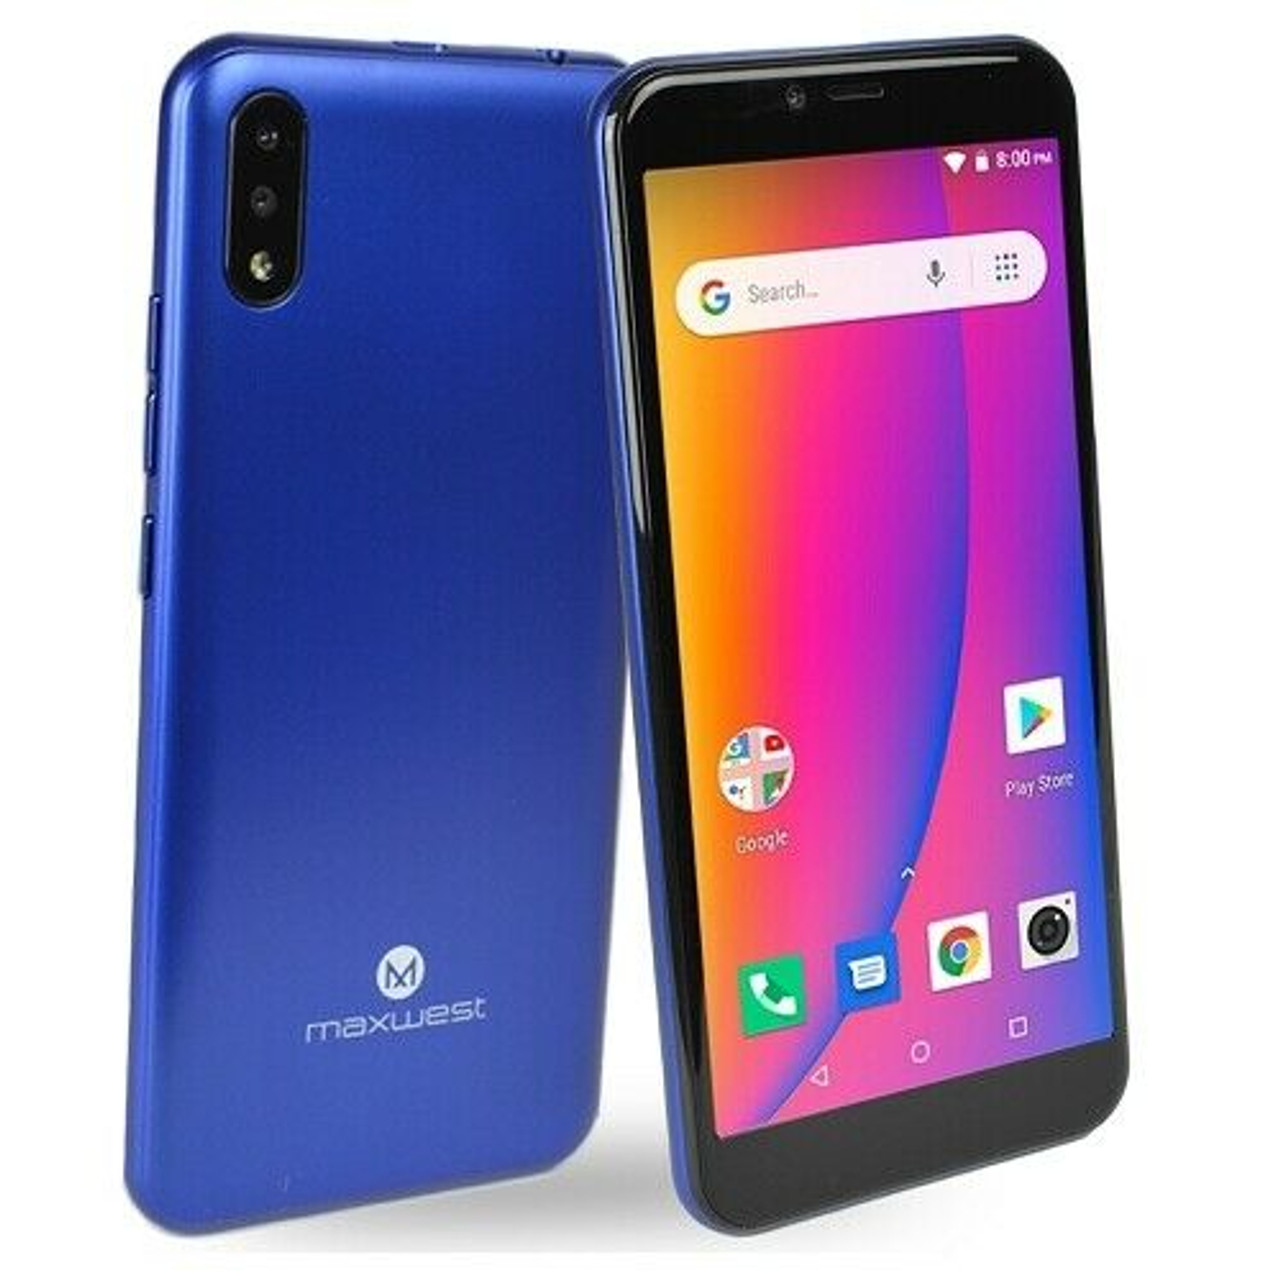 MAXWEST NITRO 5R 4G(H+) BRAND NEW GSM UNLOCKED